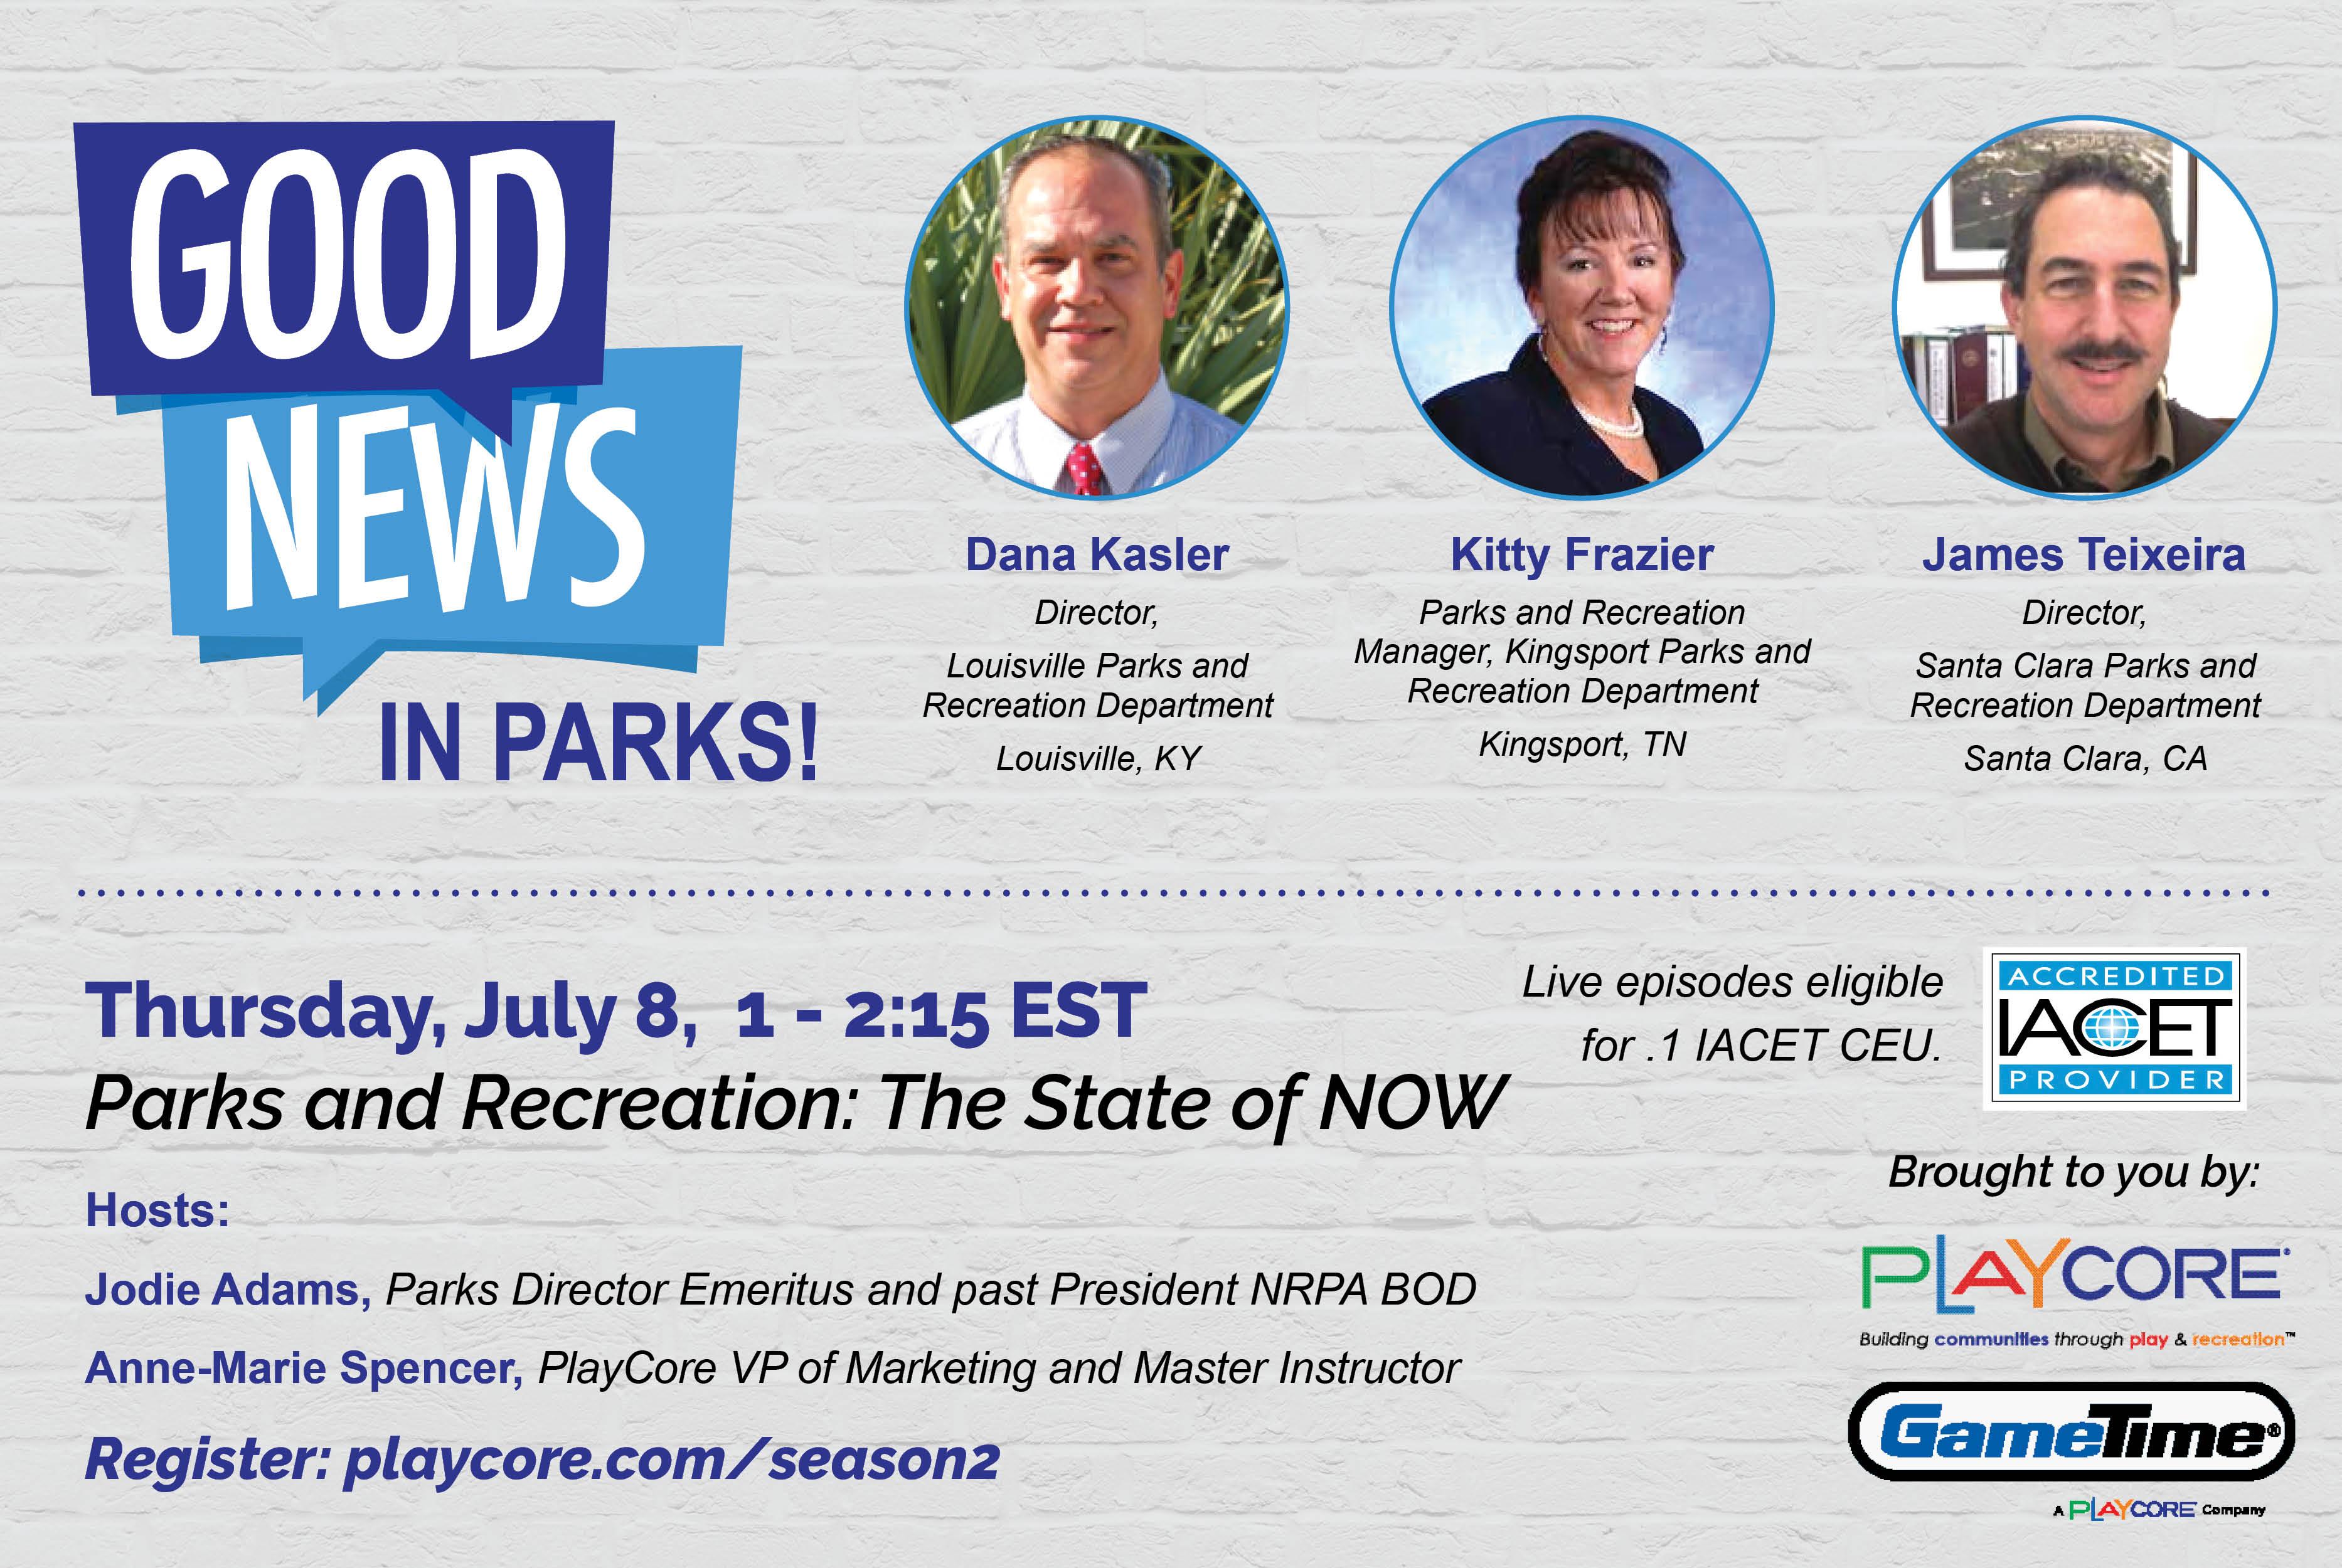 Good News in Parks - Season 2 - Banner Image-Episode 7